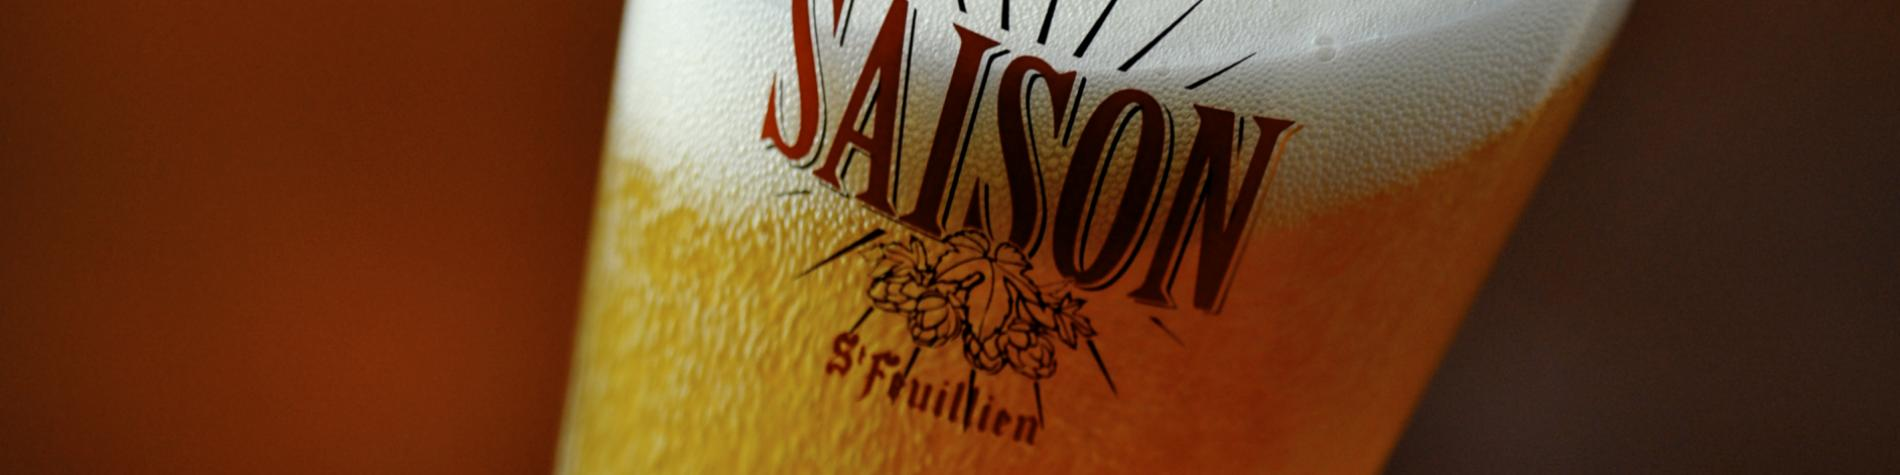 Brasserie Saint-Feuillien